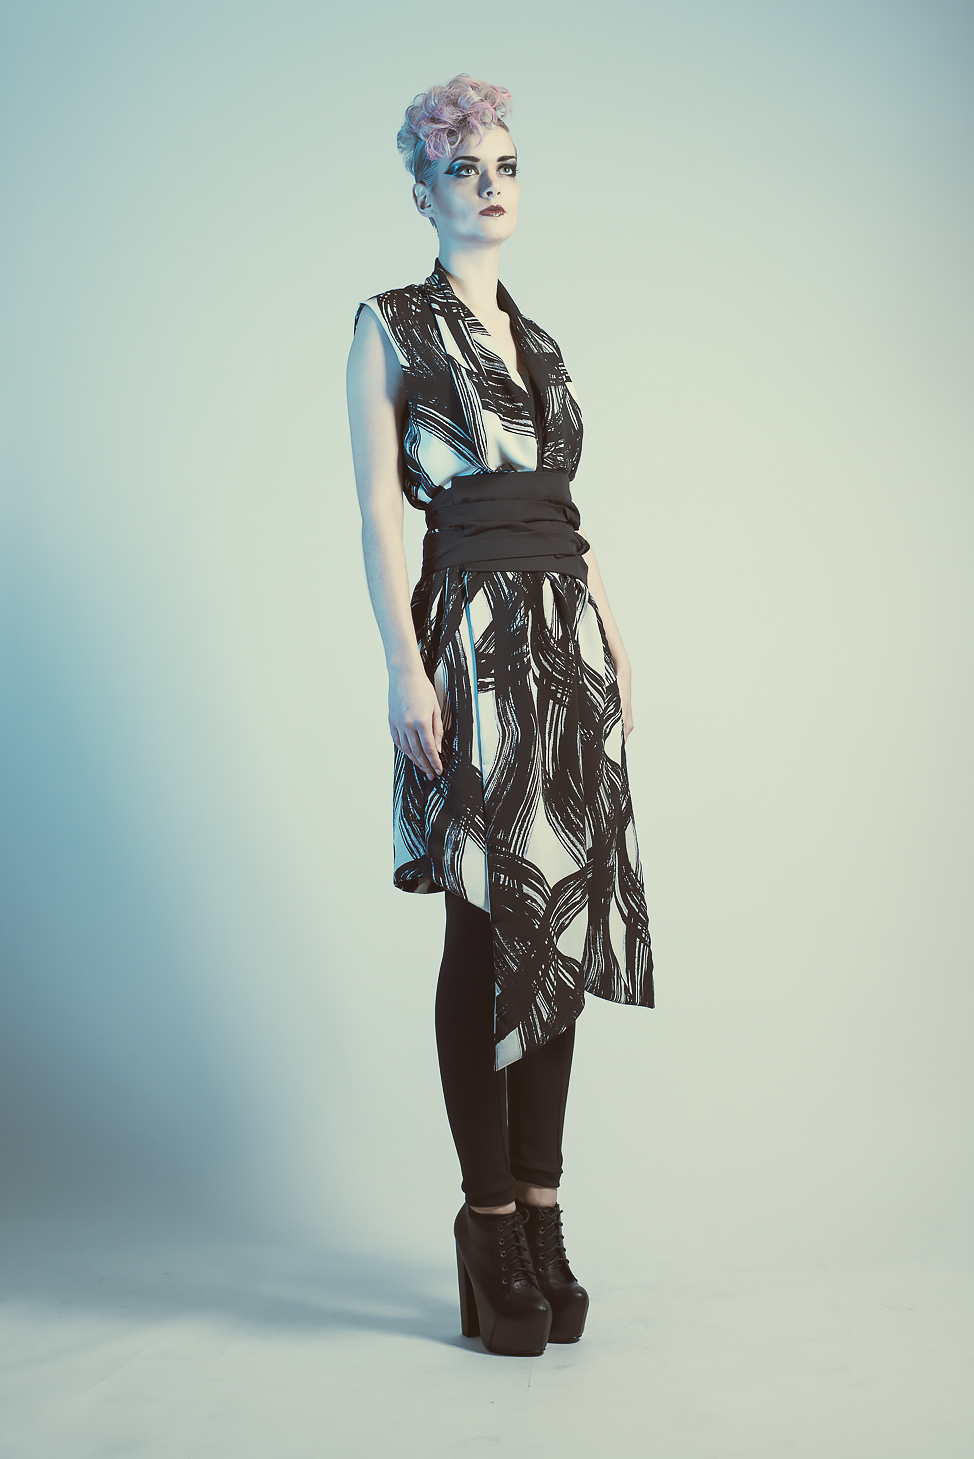 zaramia-ava-zaramiaava-leeds-fashion-designer-ethical-sustainable-tailored-minimalist-emi-print-black-rei-belt-versatile-drape-cowl-styling-womenswear-models-photoshoot-shrine-hairdressers-77